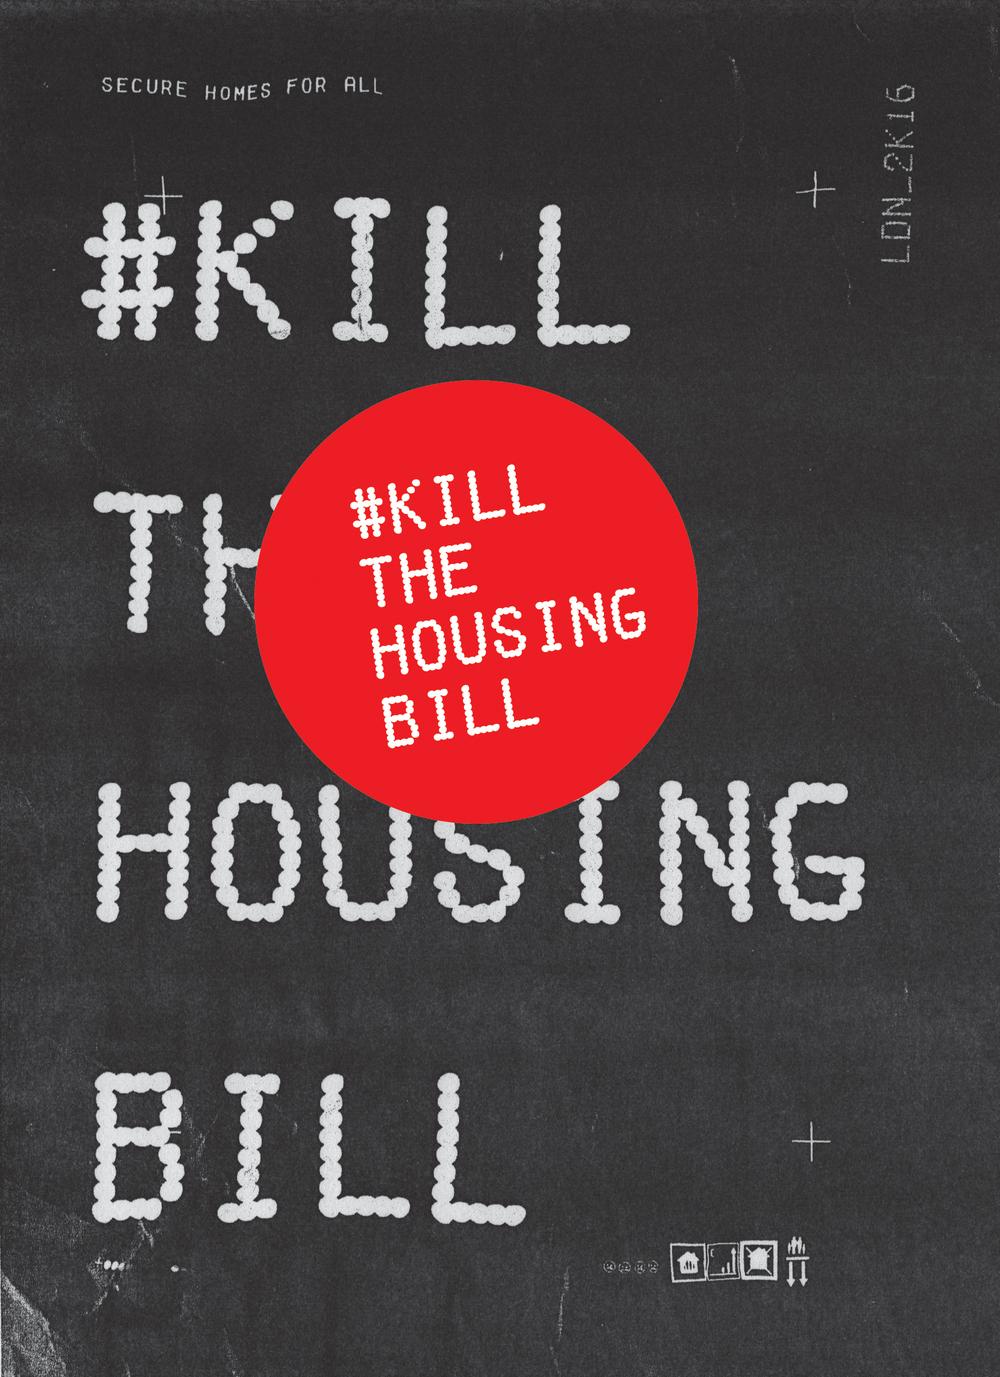 KILL THE HOUSING BILL P-COPY-FLYER_single-STICKERS10.jpg